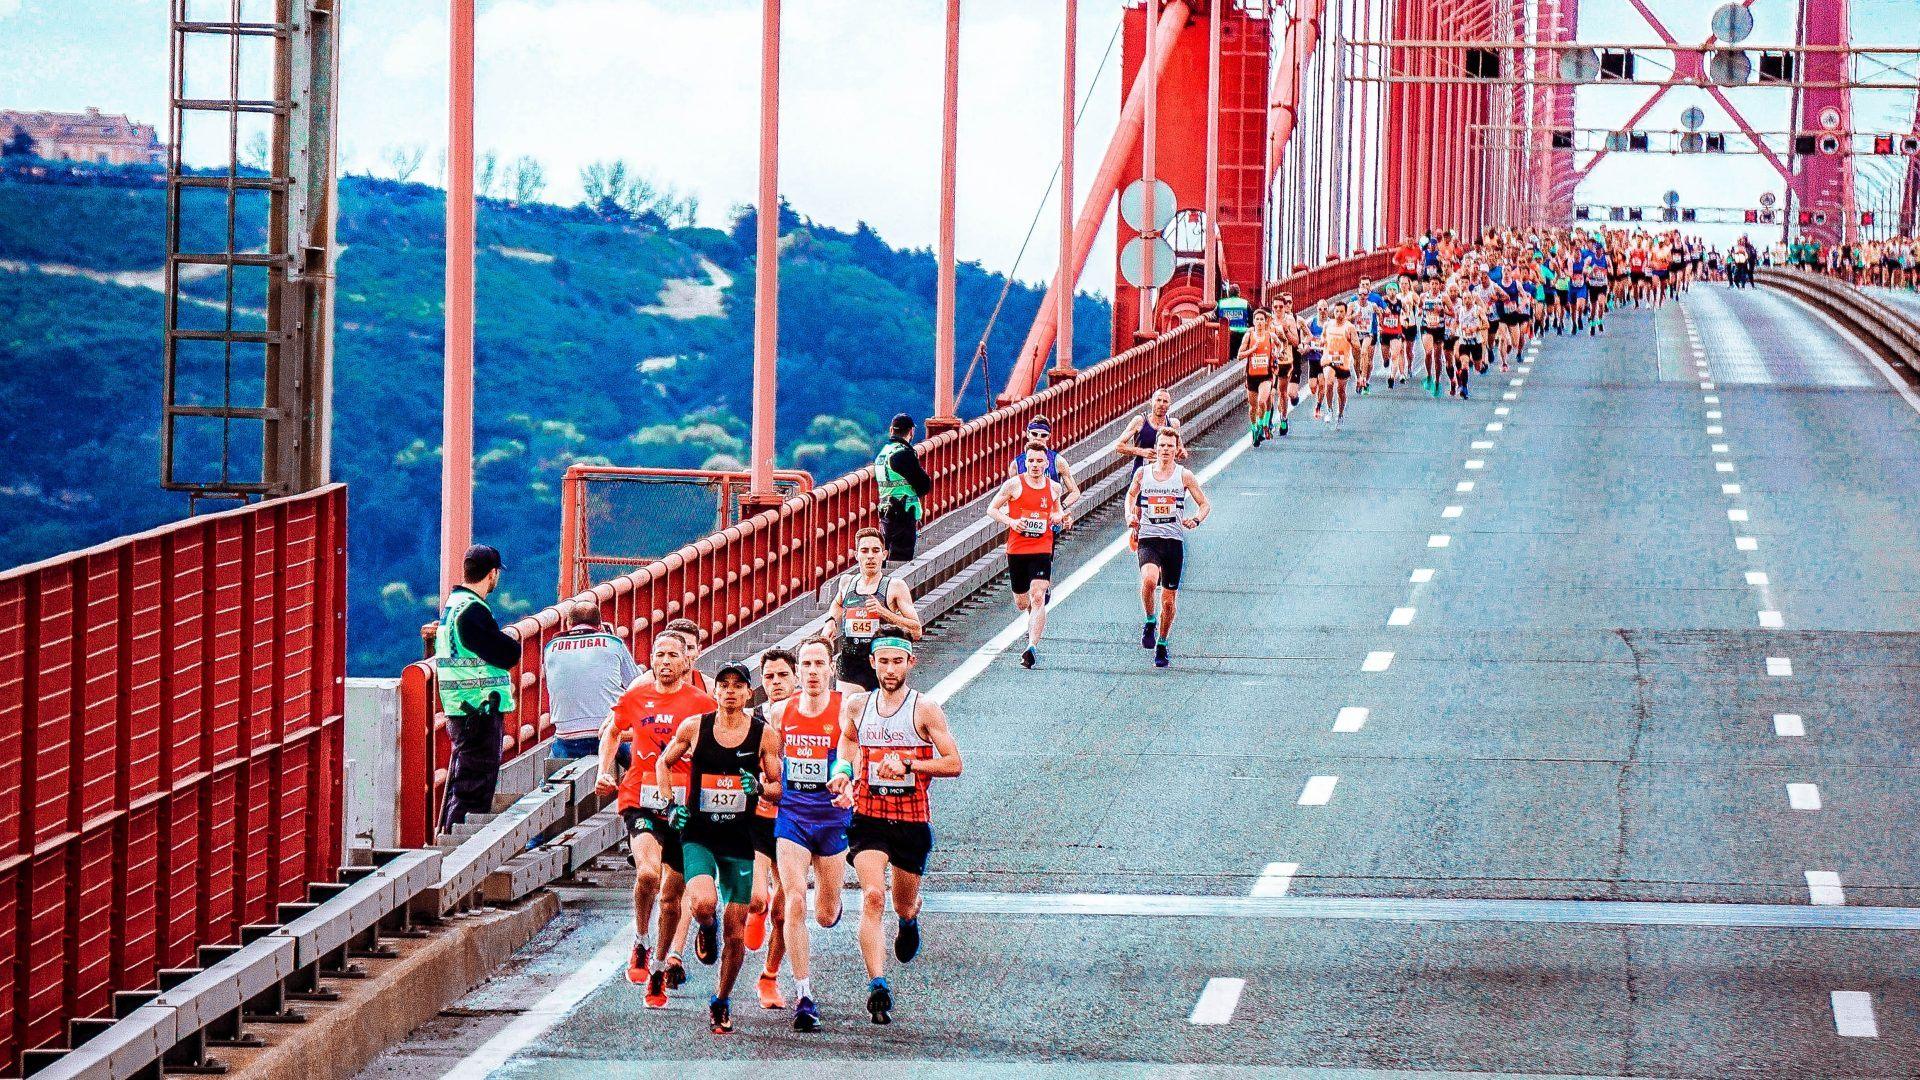 Running over bridge